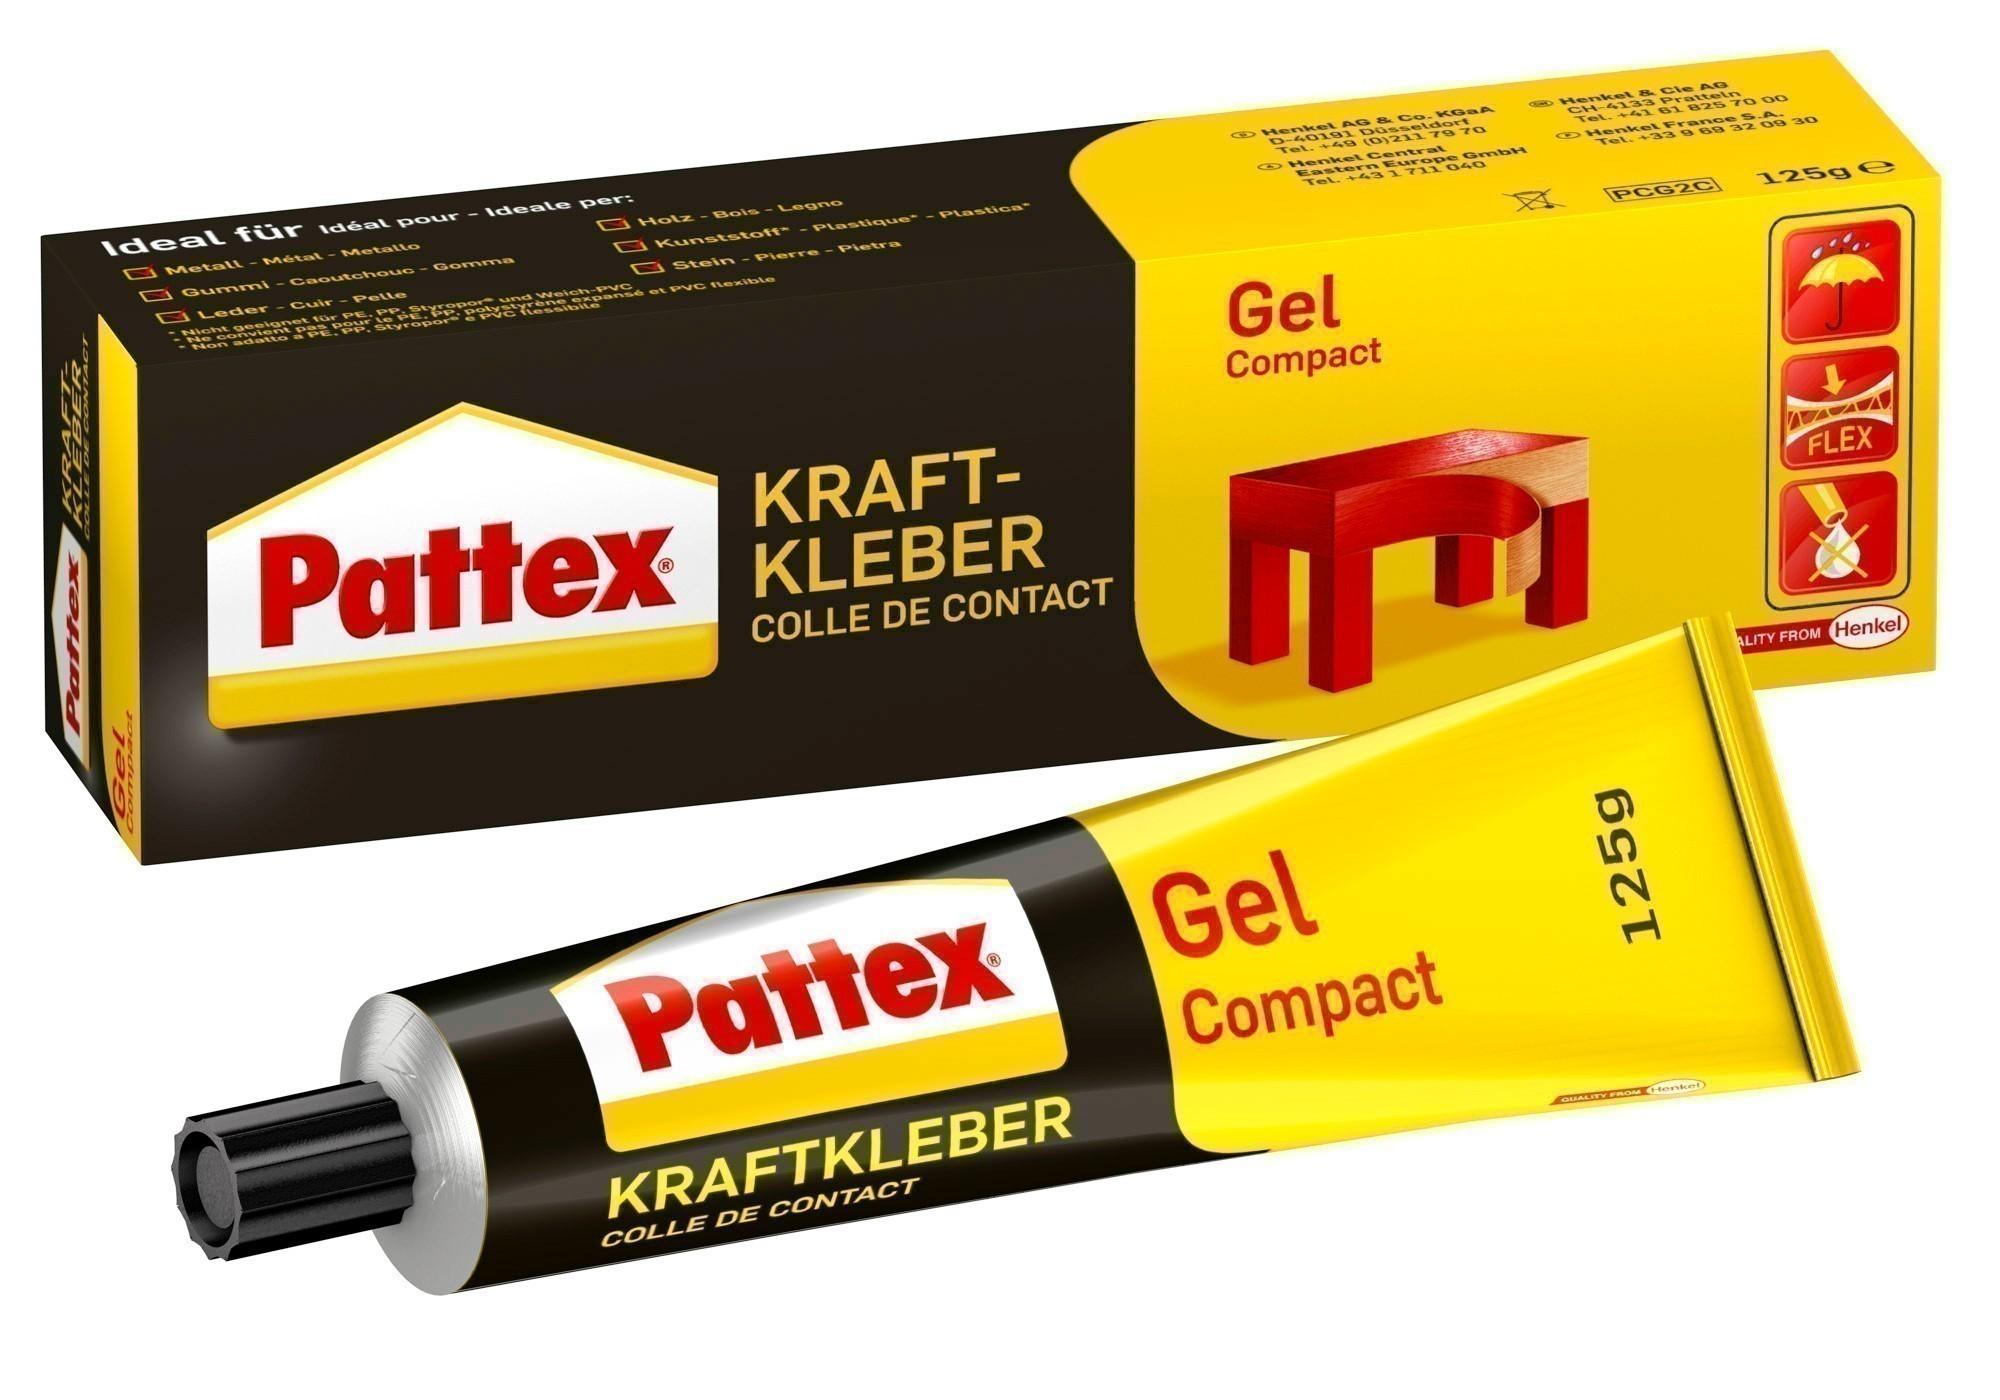 Pattex Kraftkleber Gel / Compact 125g Bild 1